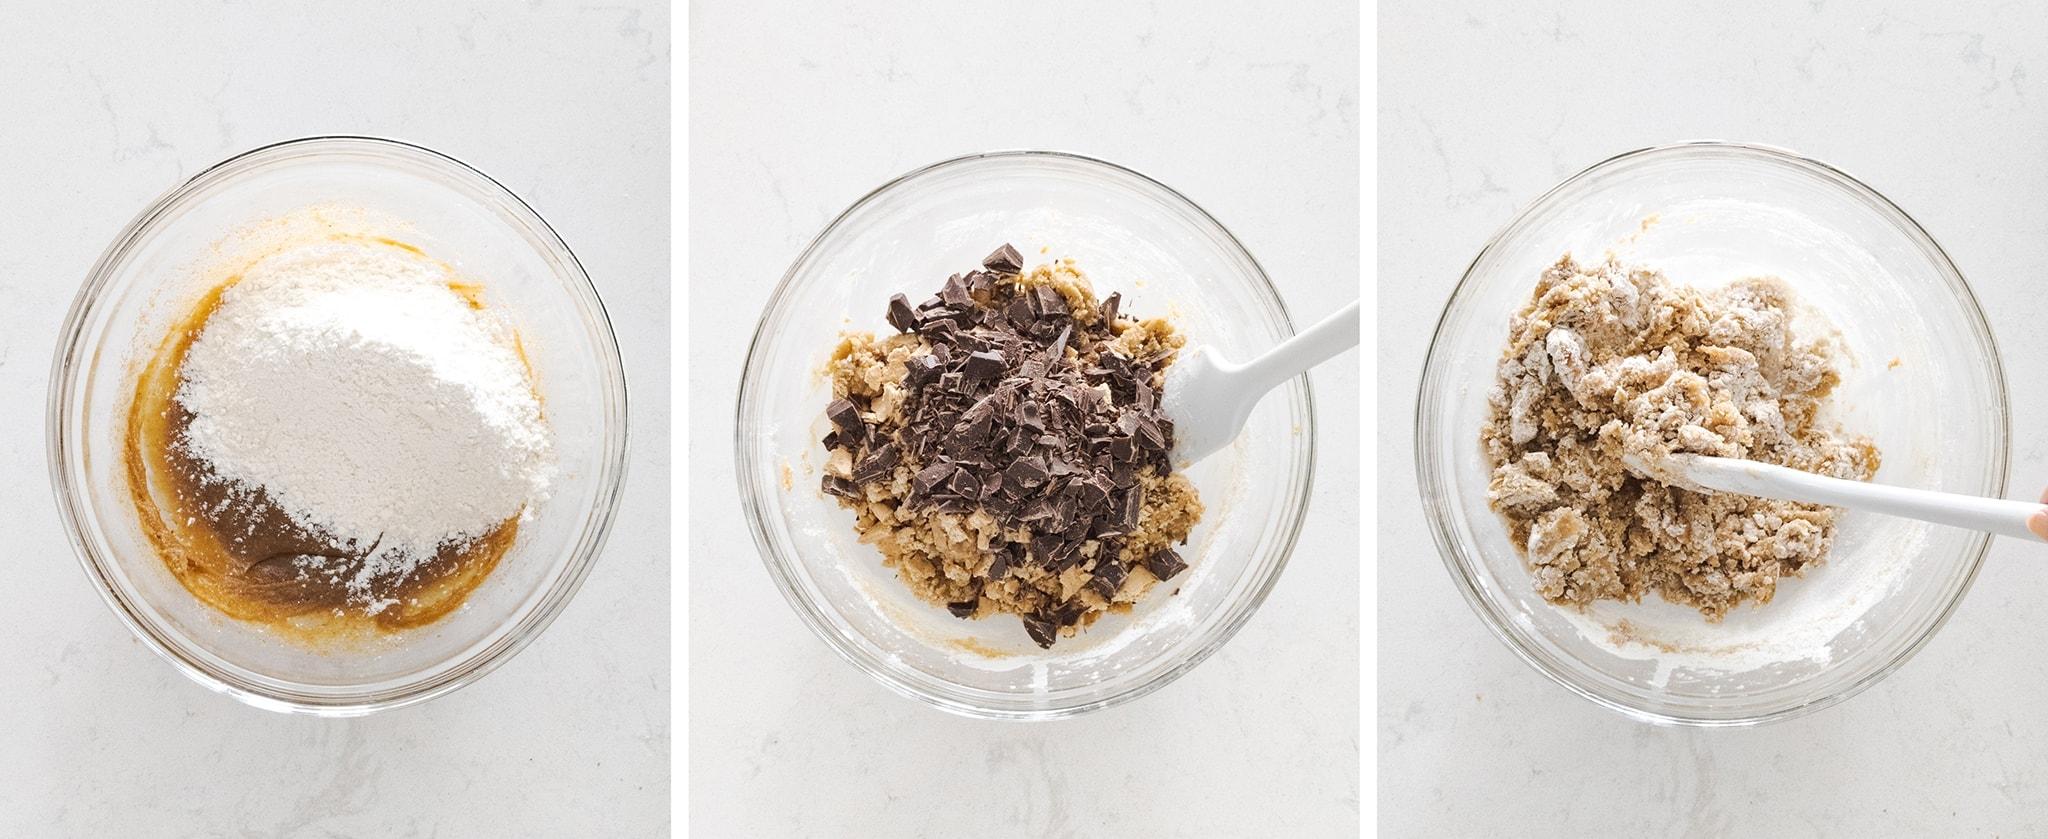 folding flour, graham cracker, and chopped chocolate into cookie dough